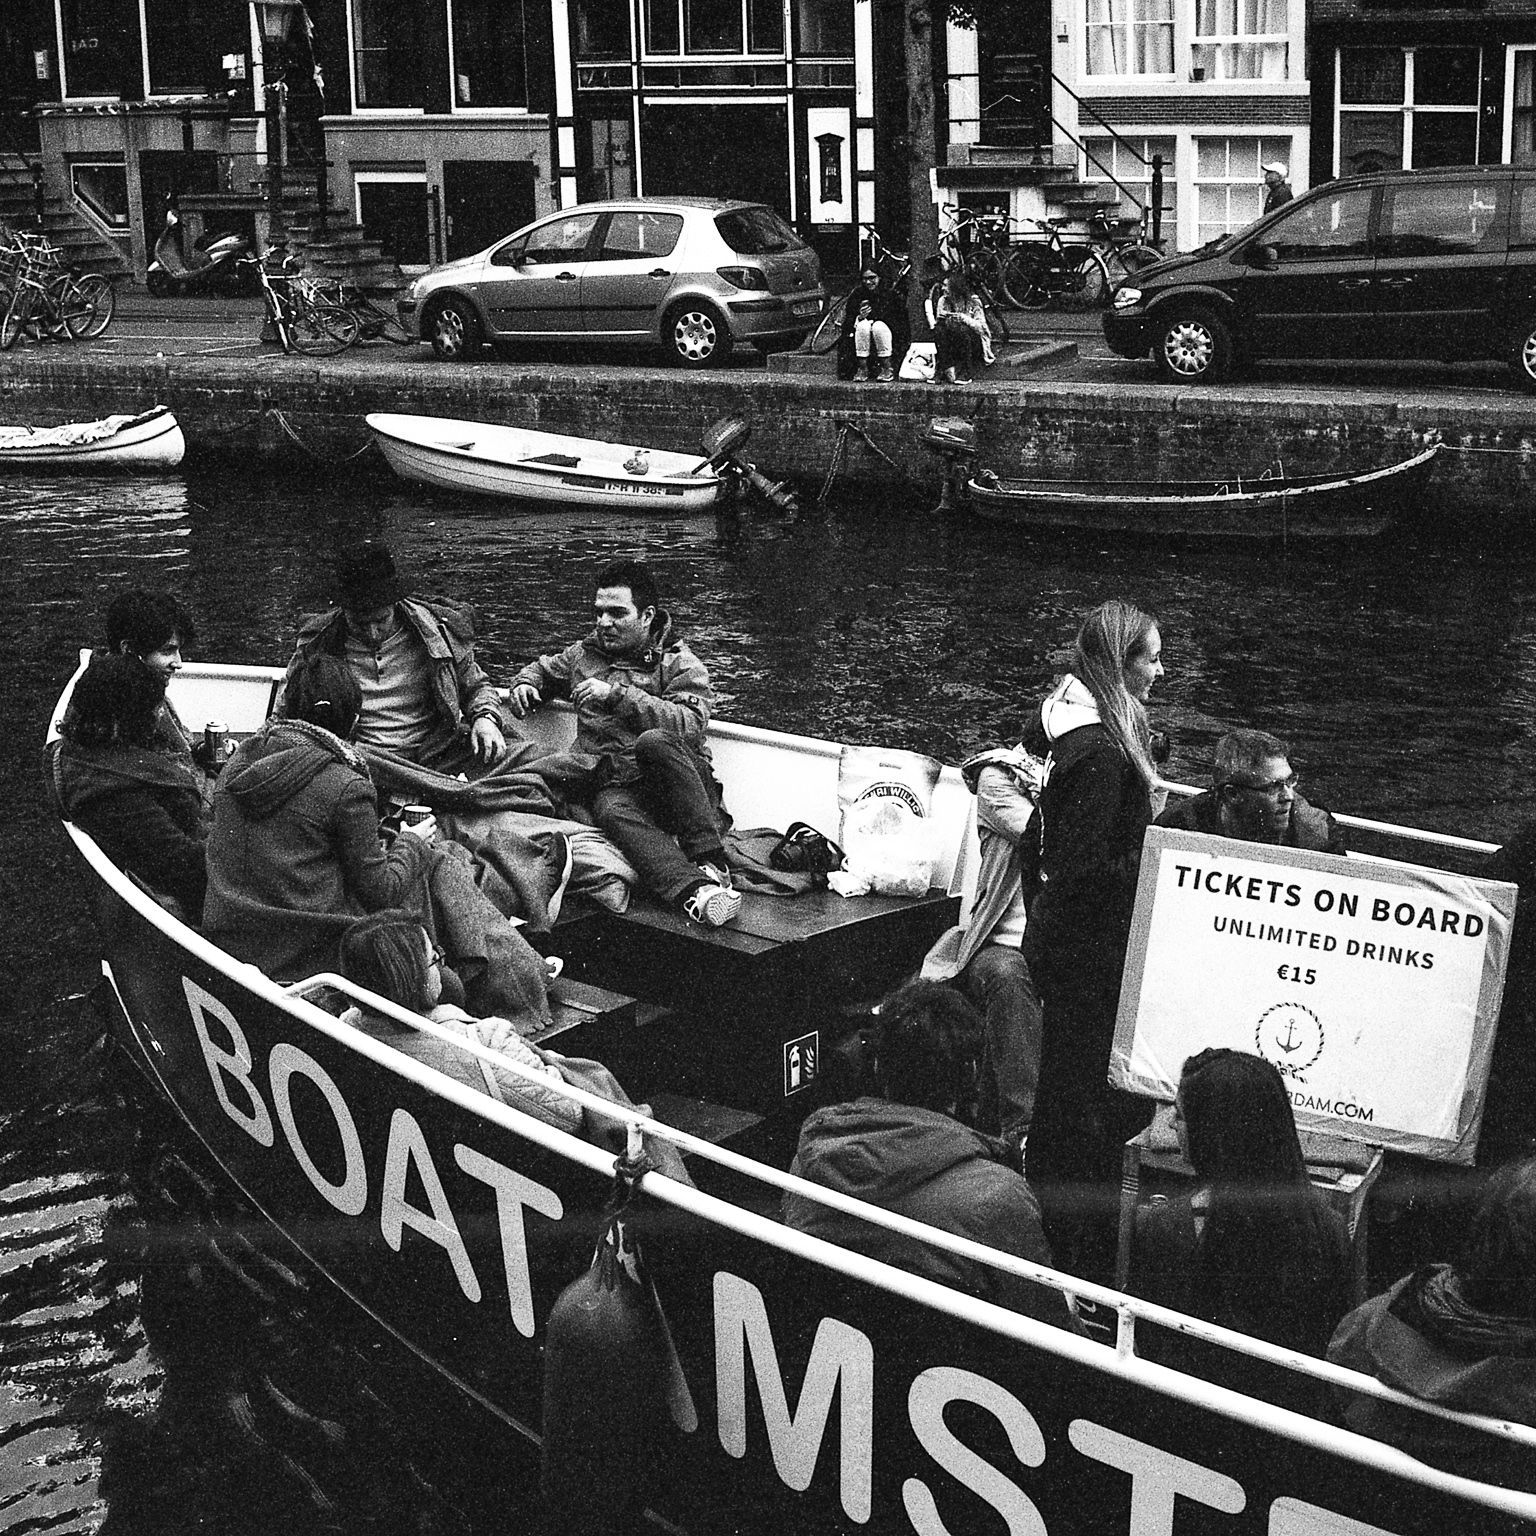 001-Amsterdam.jpg